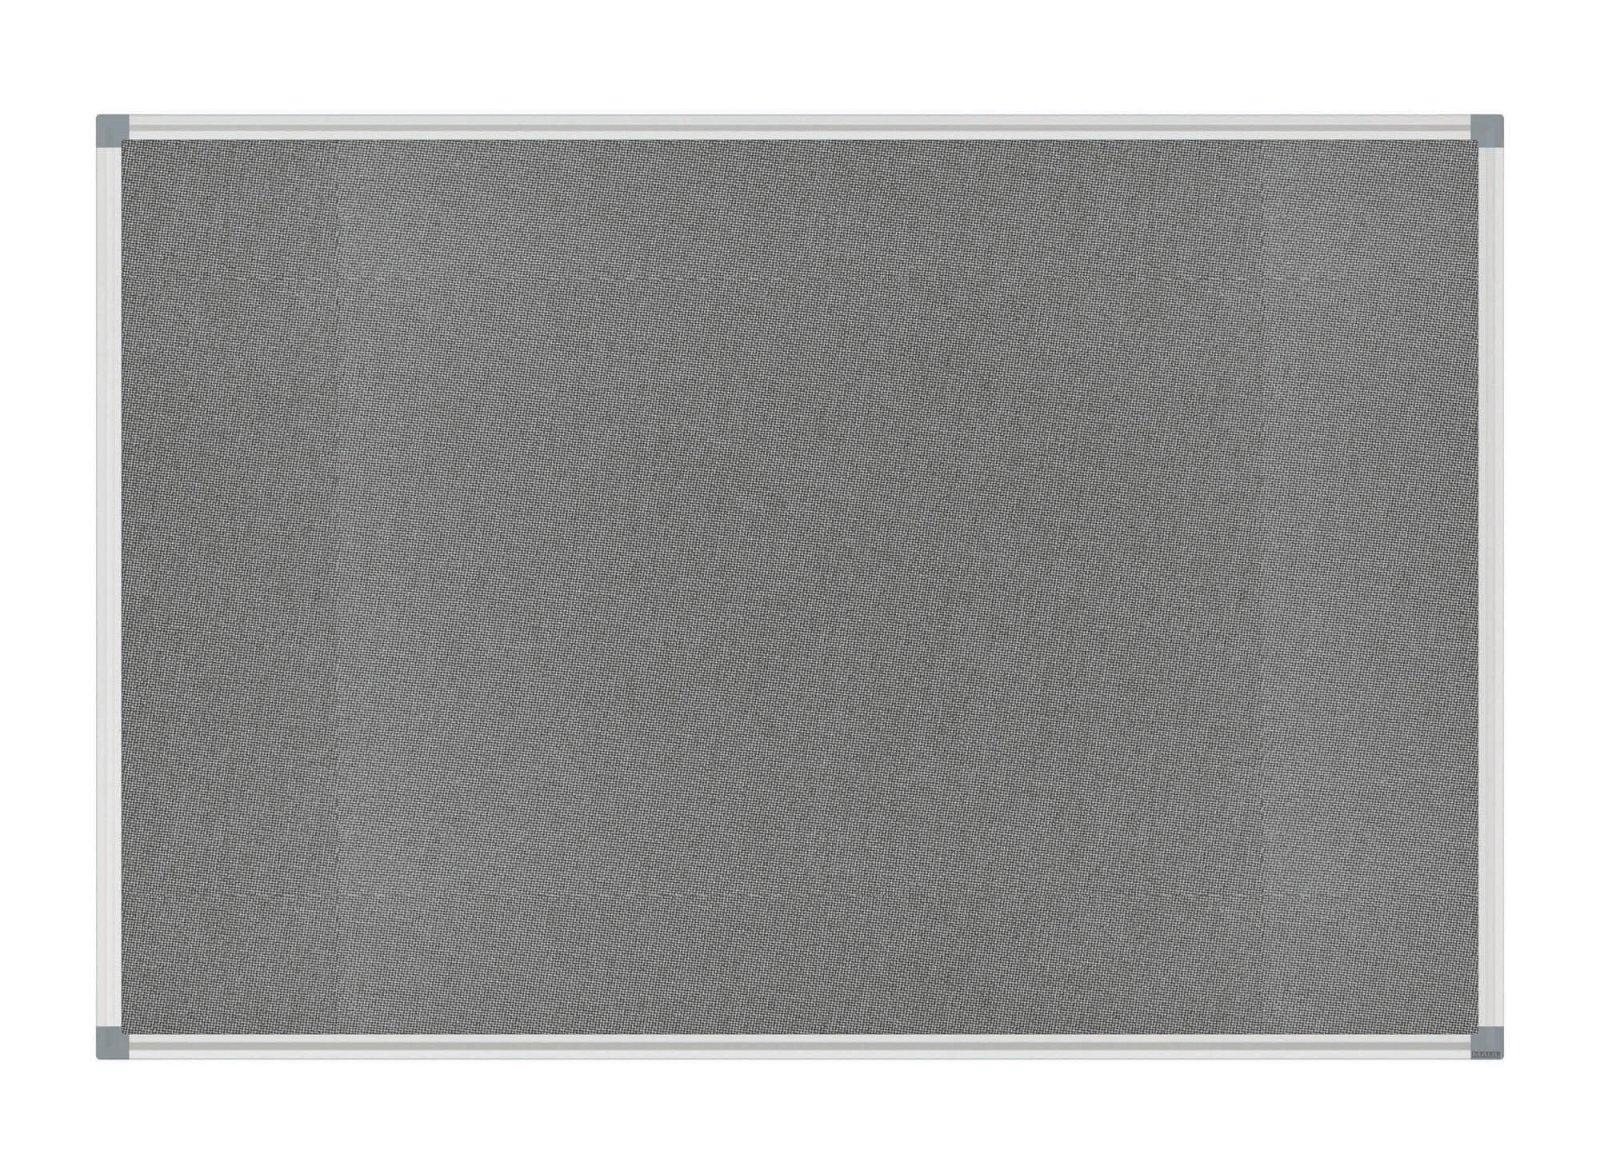 Pinnboard MAULstandard, Textil